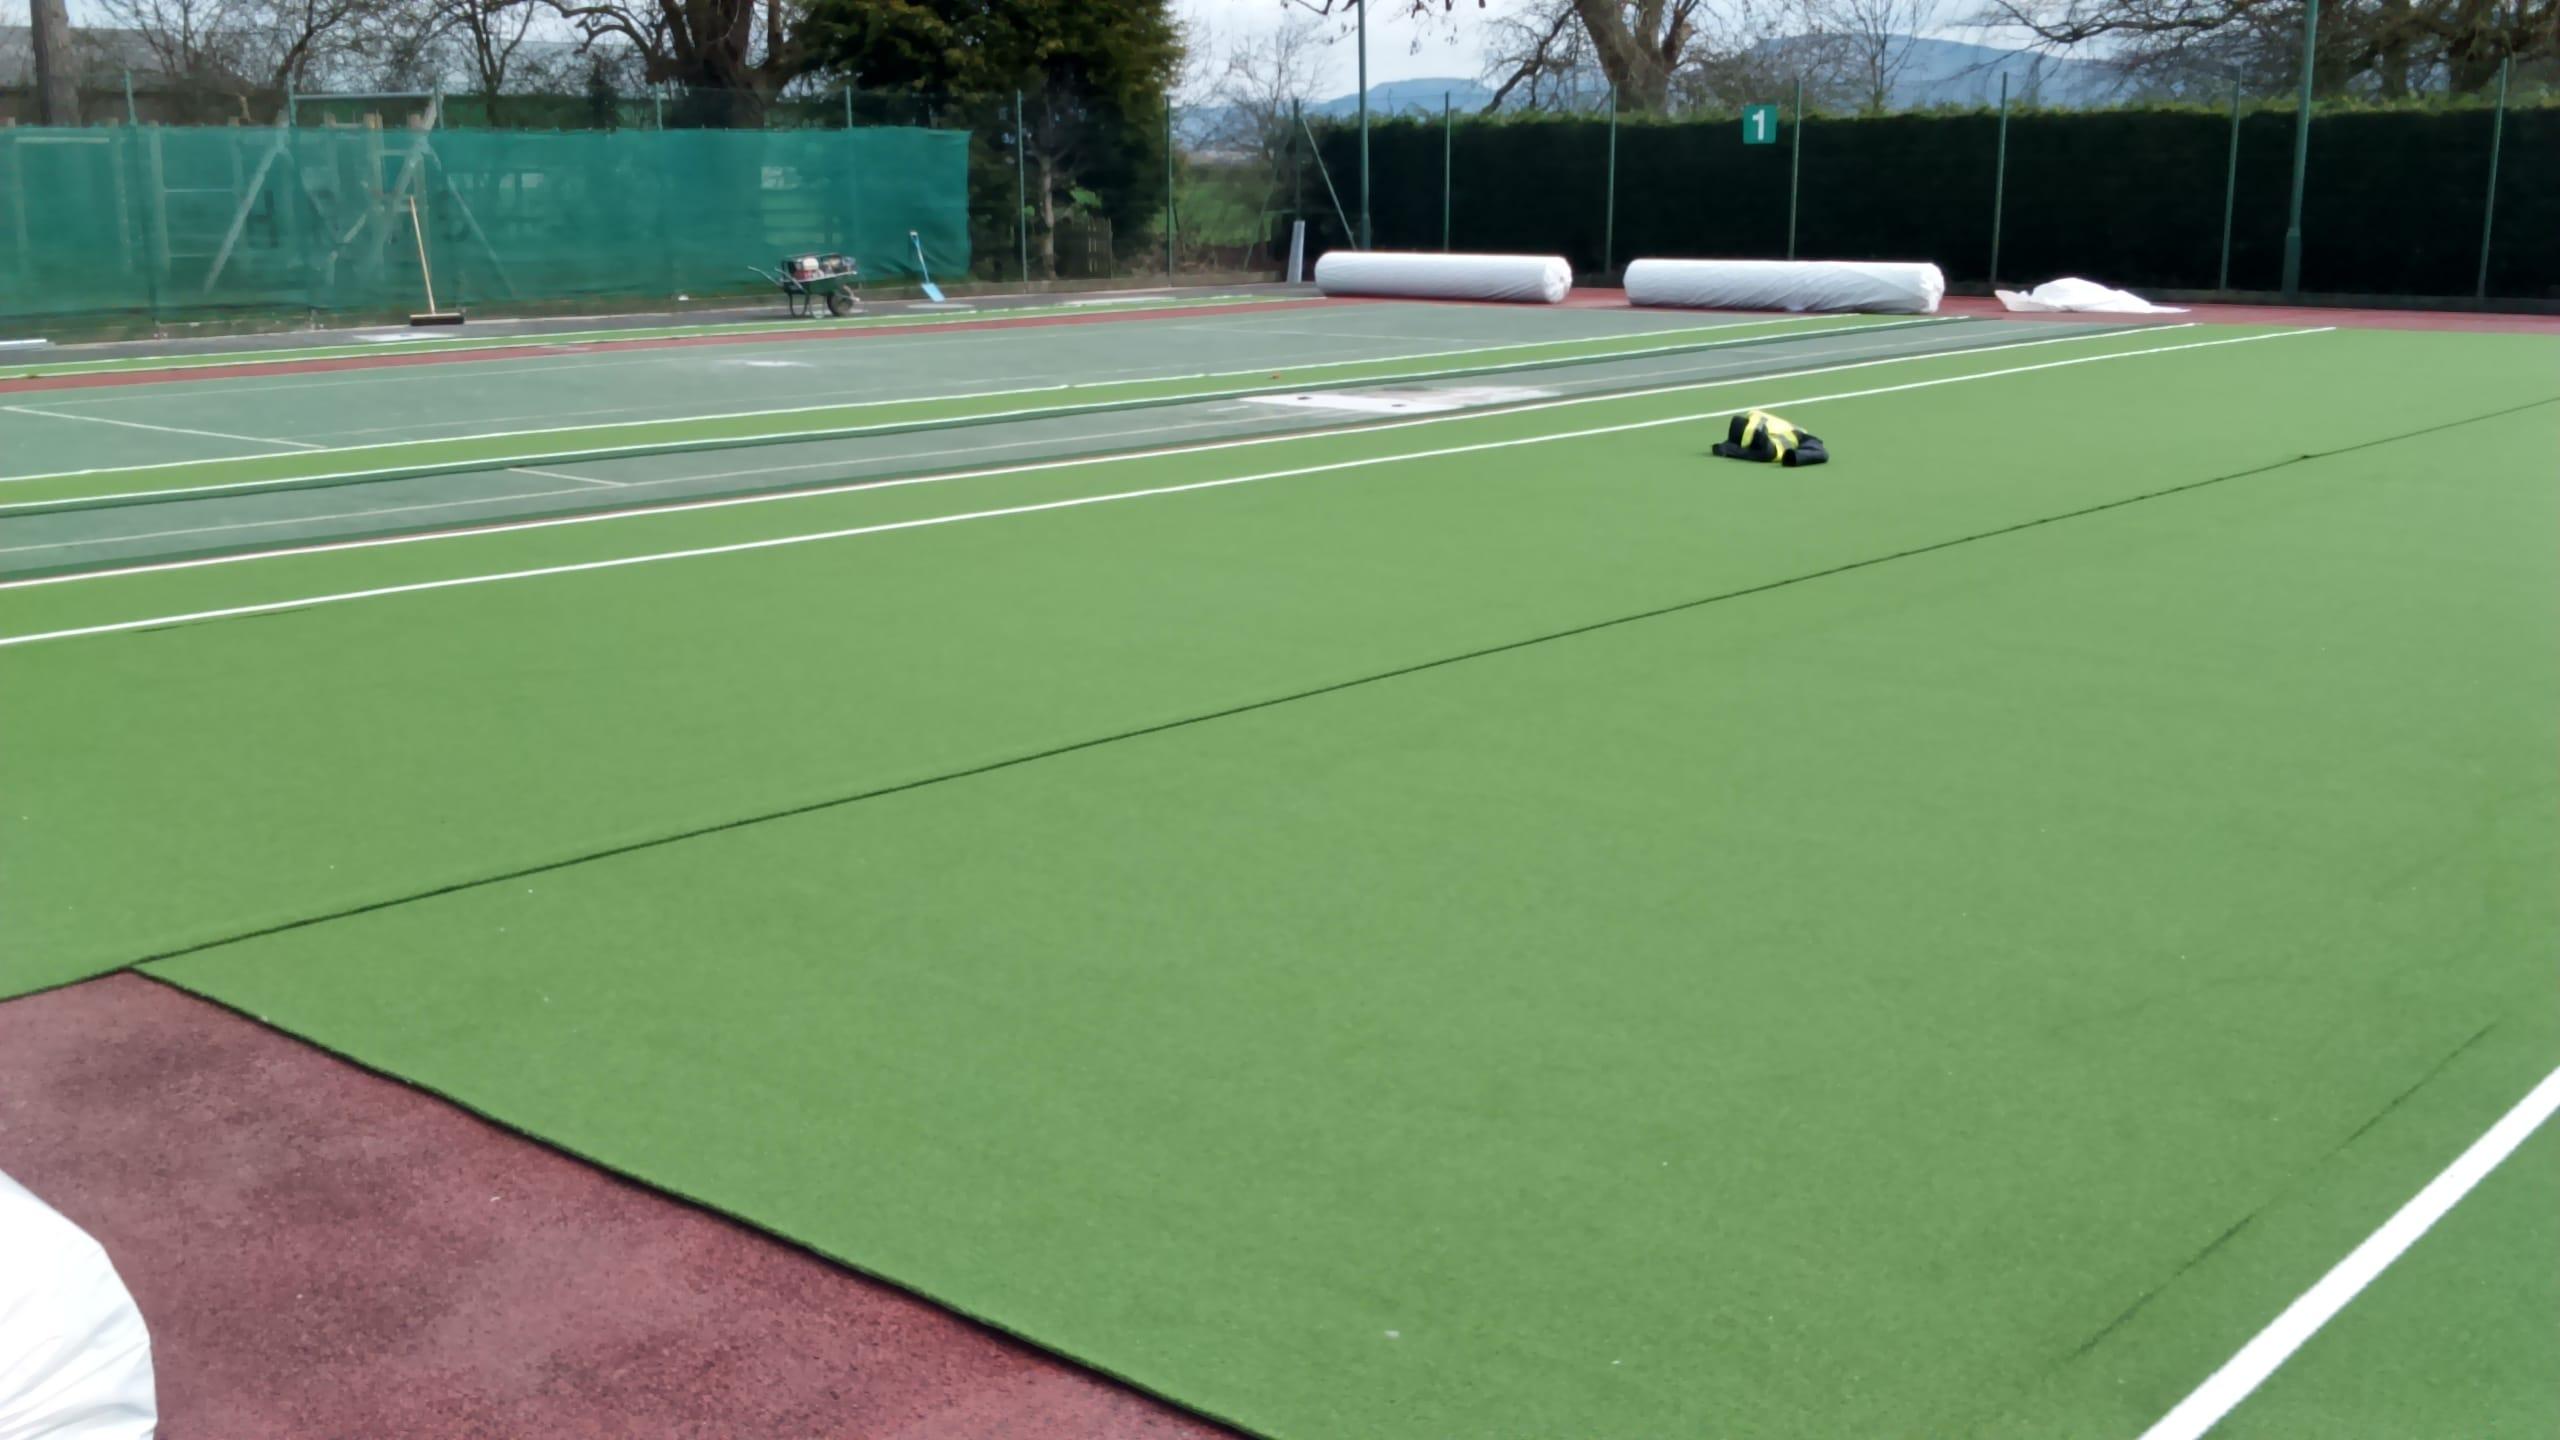 Tennis Court Resurfacing Construction Sports Courts Stm World